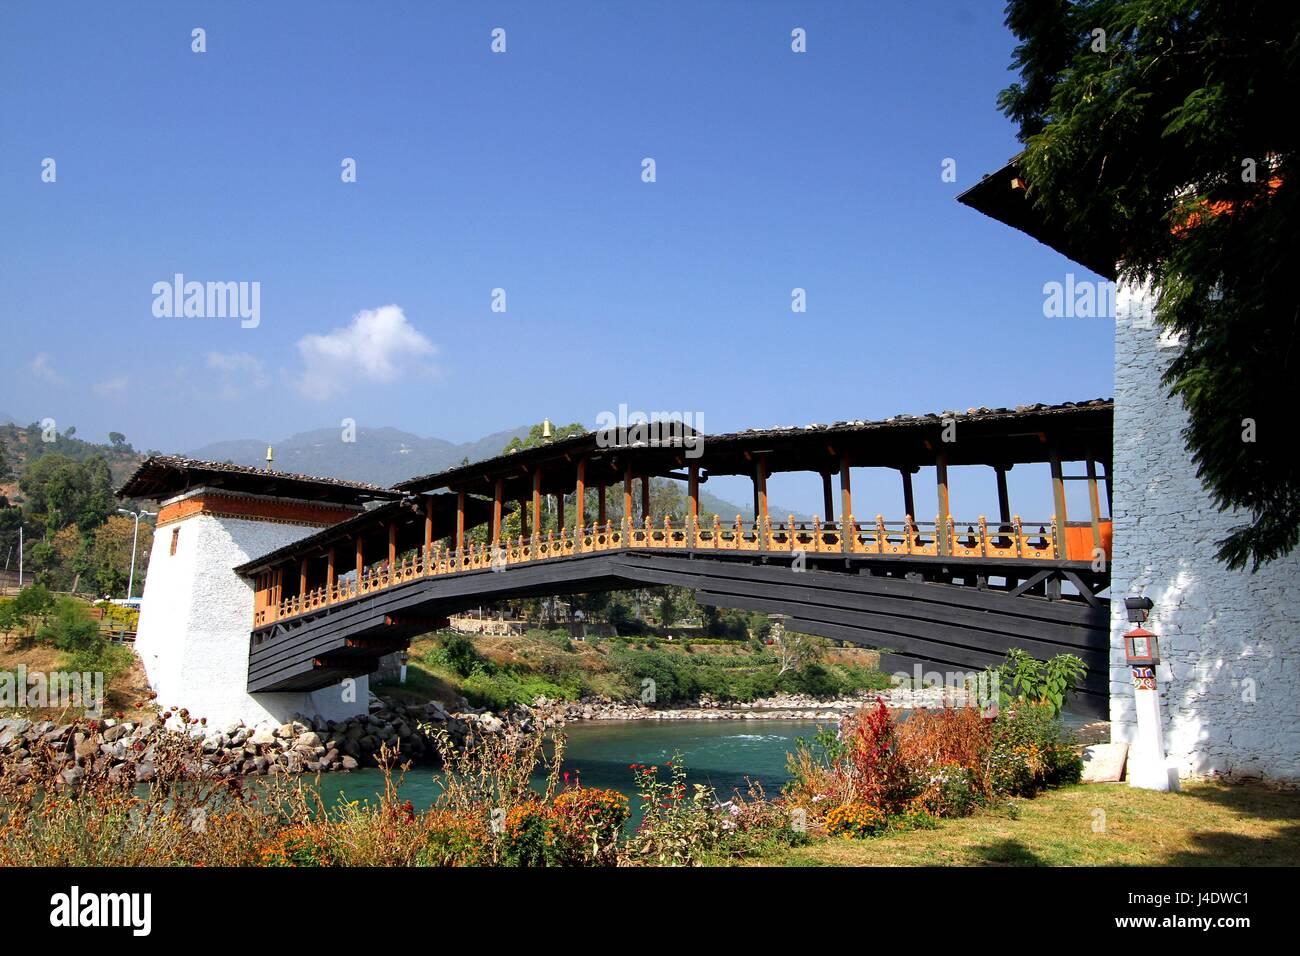 PUNA MOCCHU BAZAM : Antique  wooden bridge at Punakha Dzong Monastery or Pungthang Dewachen Phodrang (Palace of - Stock Image